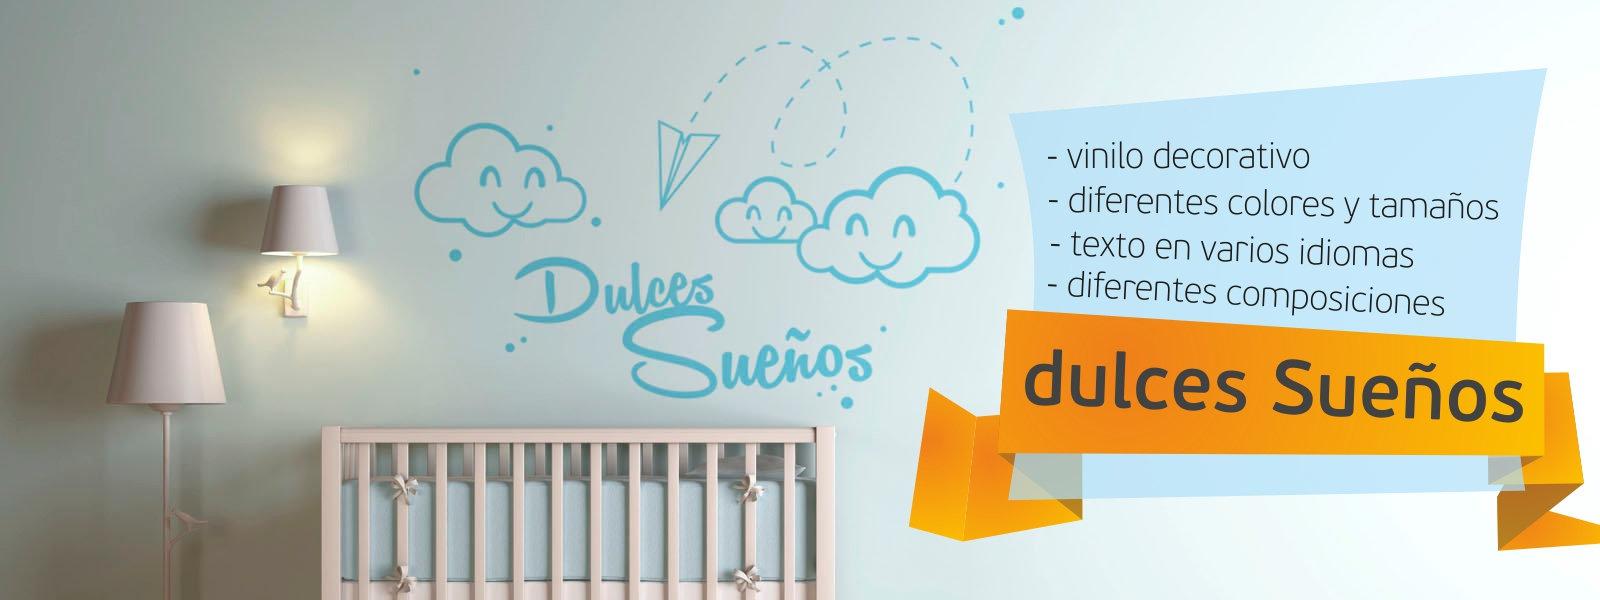 Infantiles vinilos decorativos adhesivosnatos for Vinilos decorativos infantiles musicales